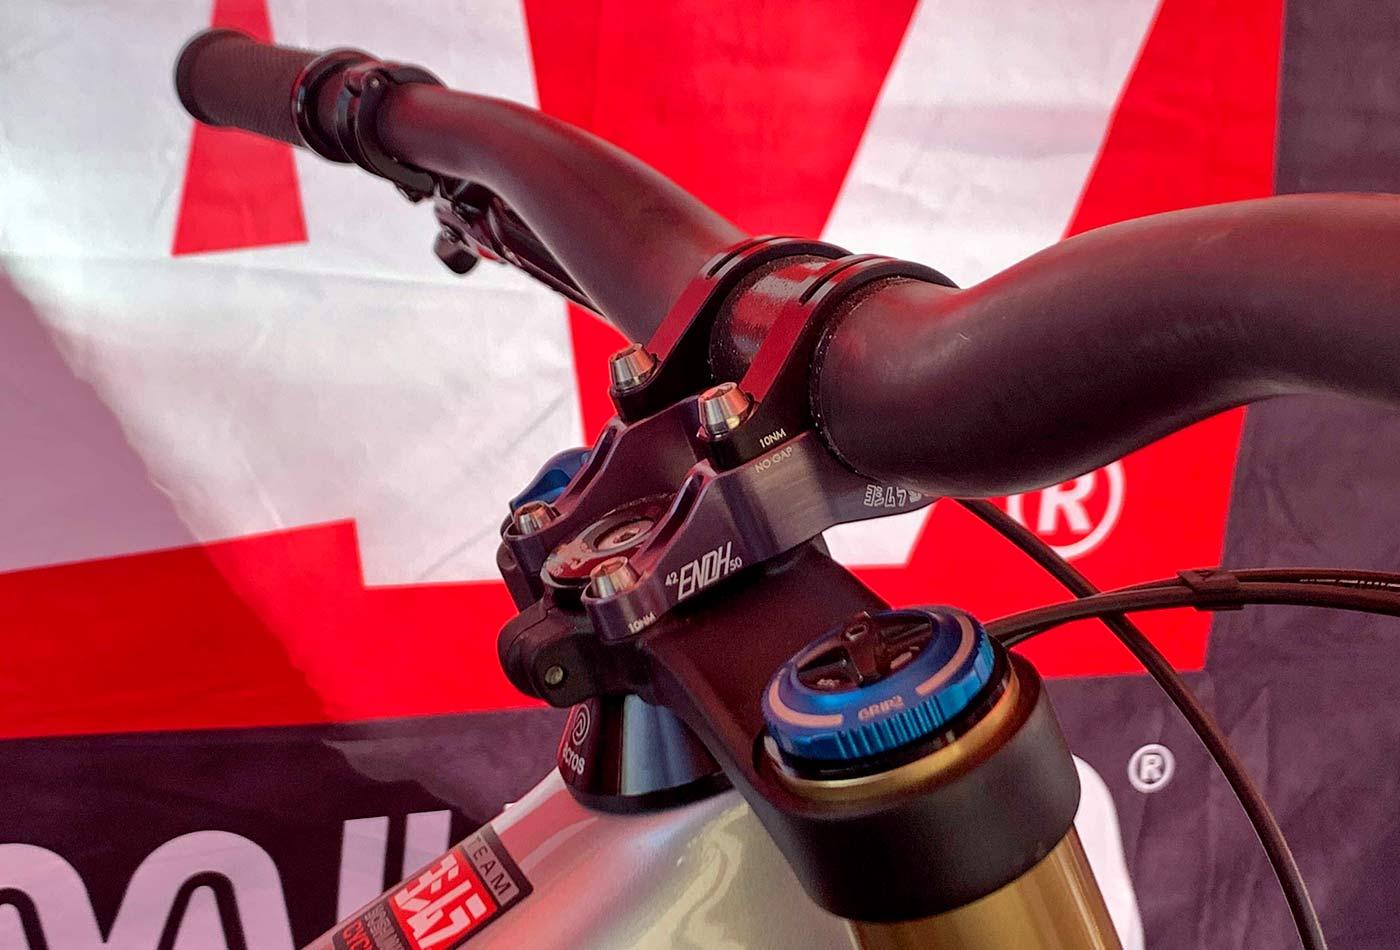 Yoshimura Enoh convertible mountain bike stem, DH direct mount